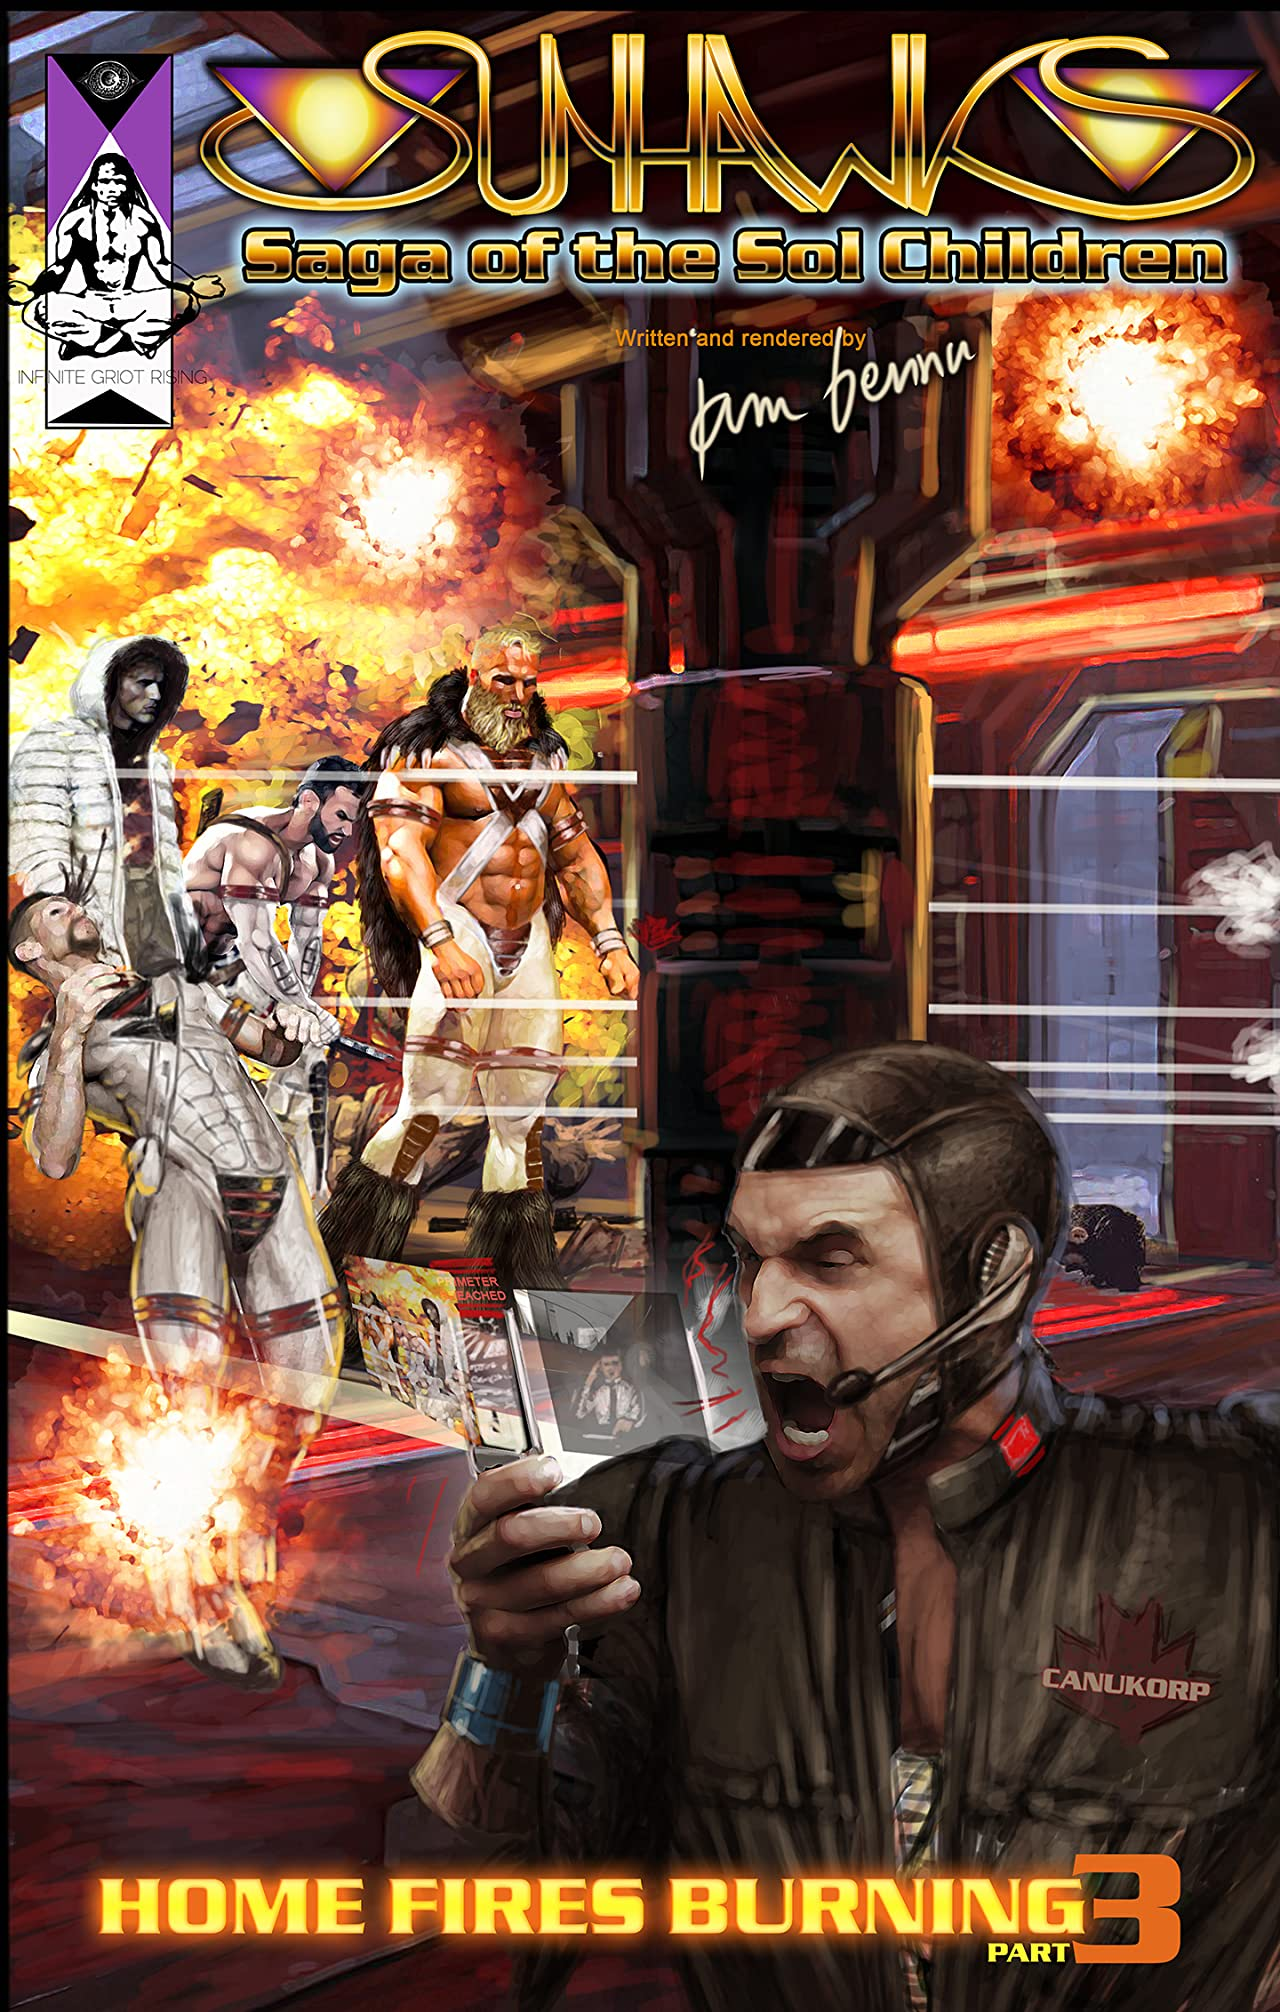 The Sunhawks Vol. 4: Homefires Burning Part 3